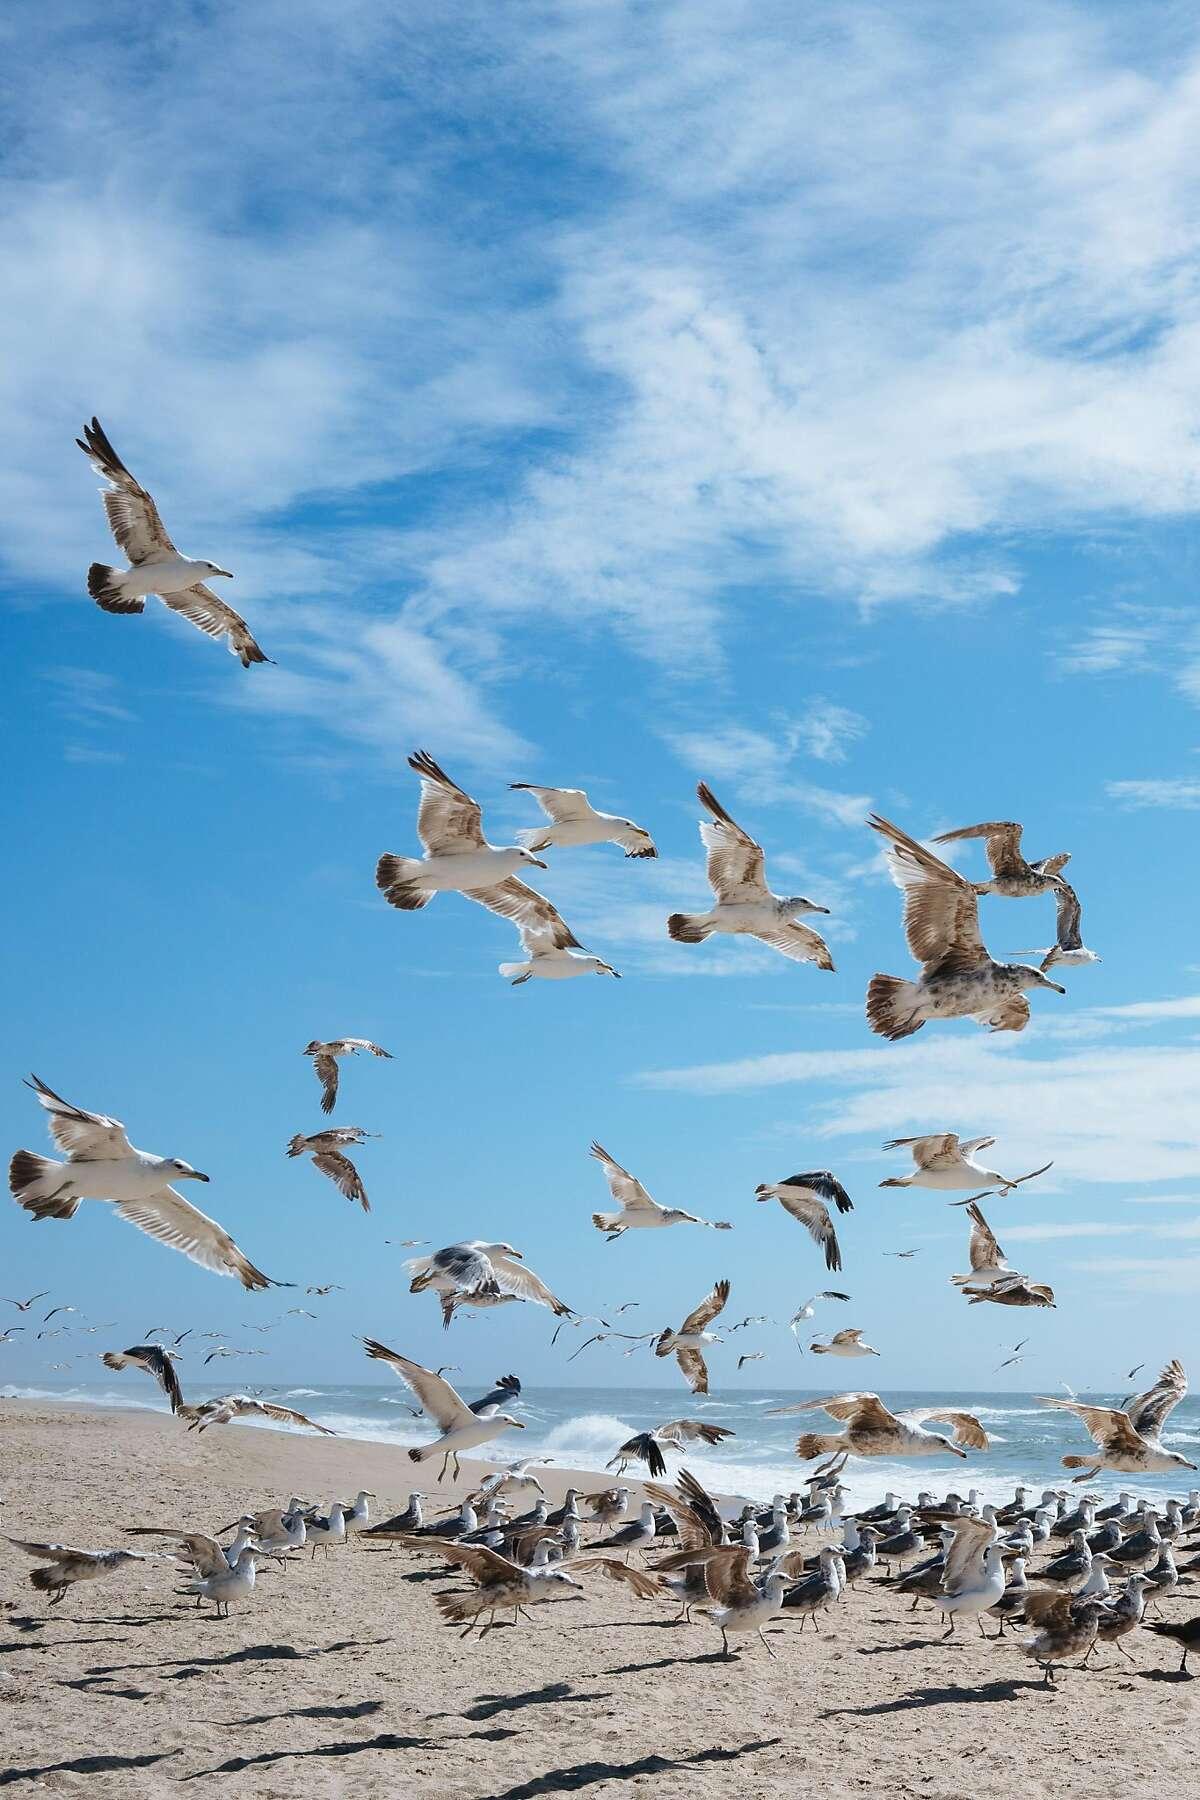 Seagulls seen along the Pescadero State Beach near Half Moon Bay, Calif., on Friday, July 6, 2018.